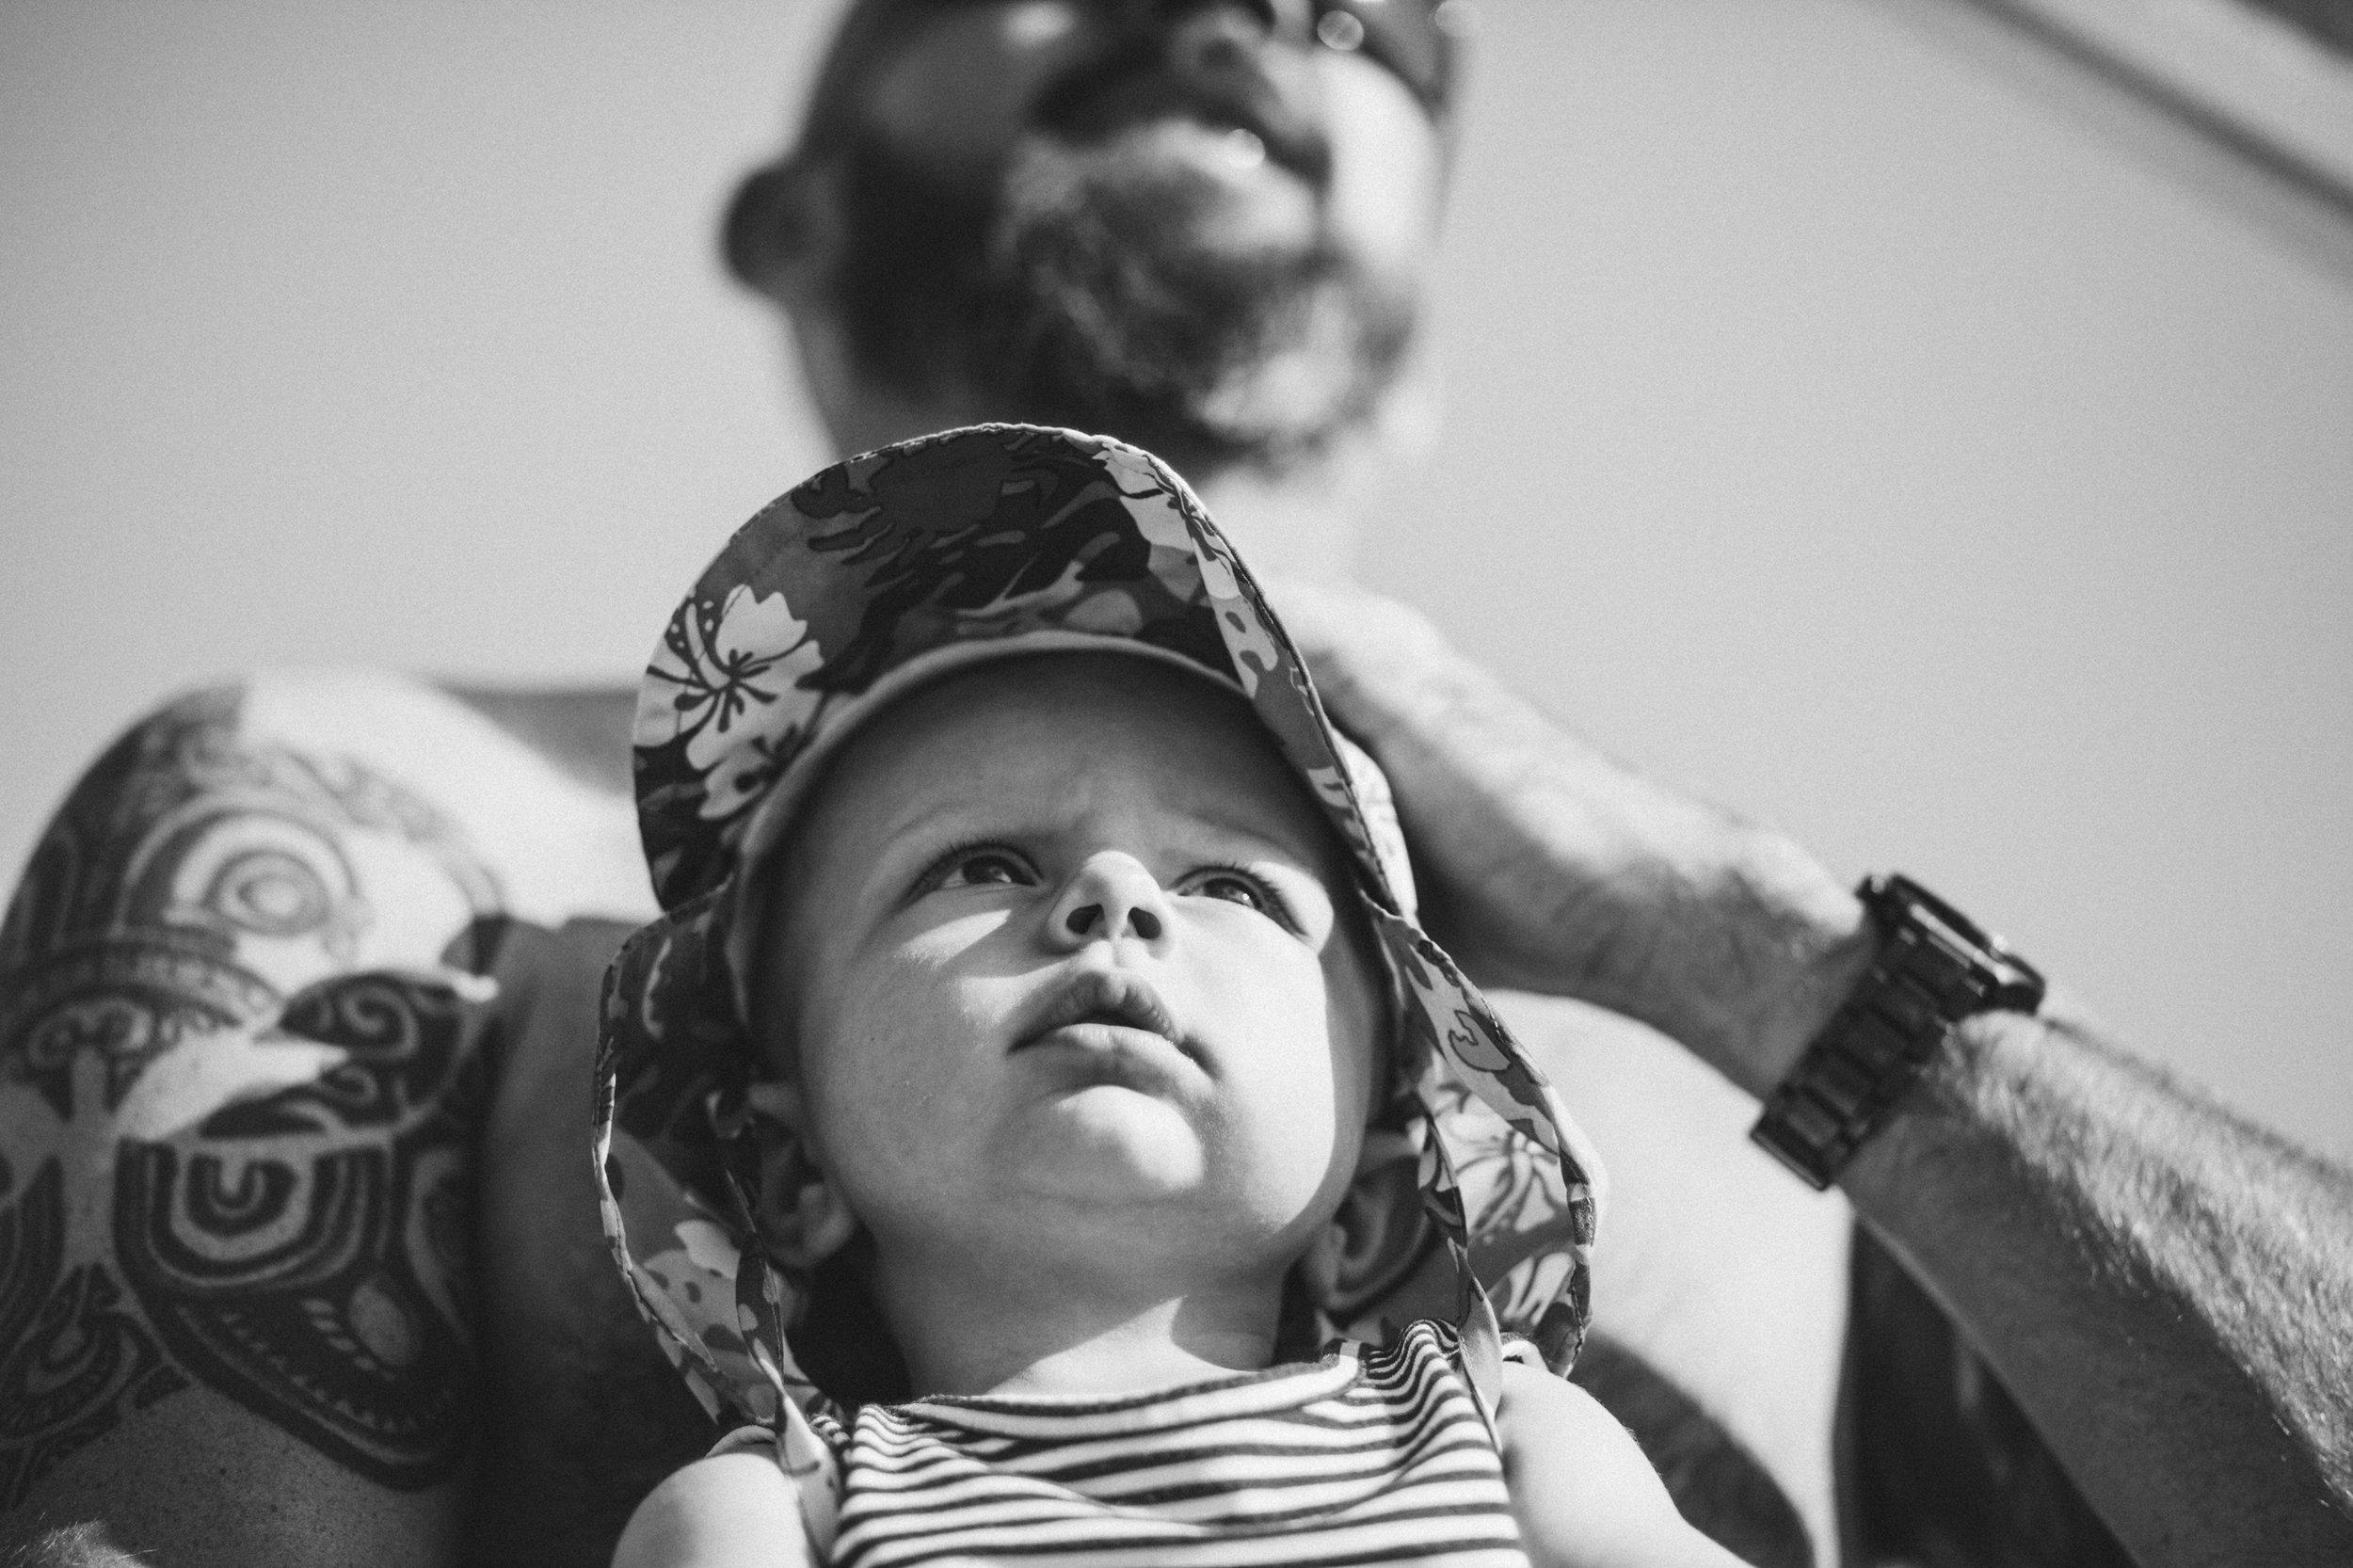 Steph+Brice-SunwayPhotography-19.jpg